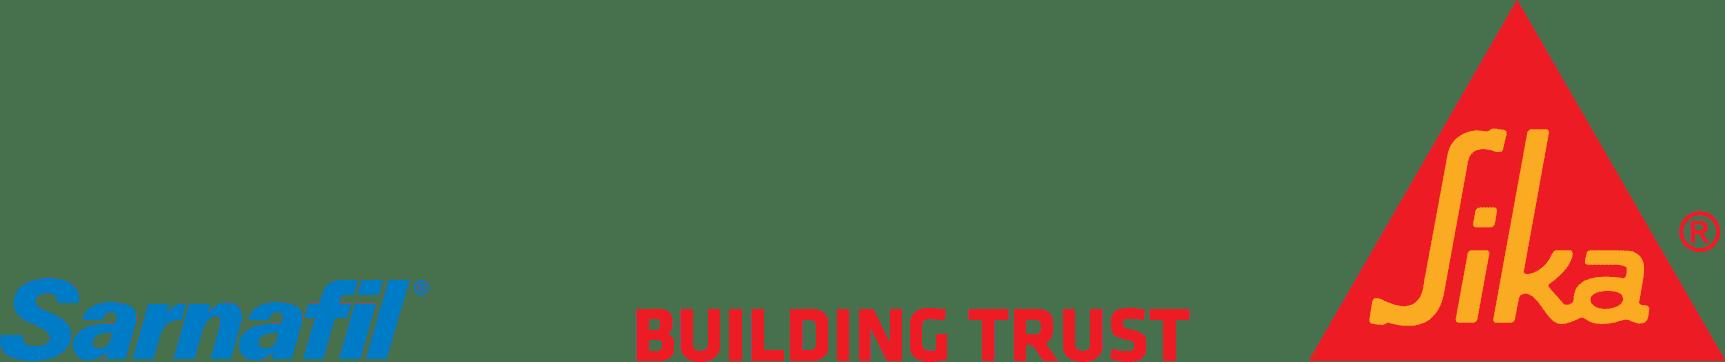 Sarnafil Sika Building Trust Logo